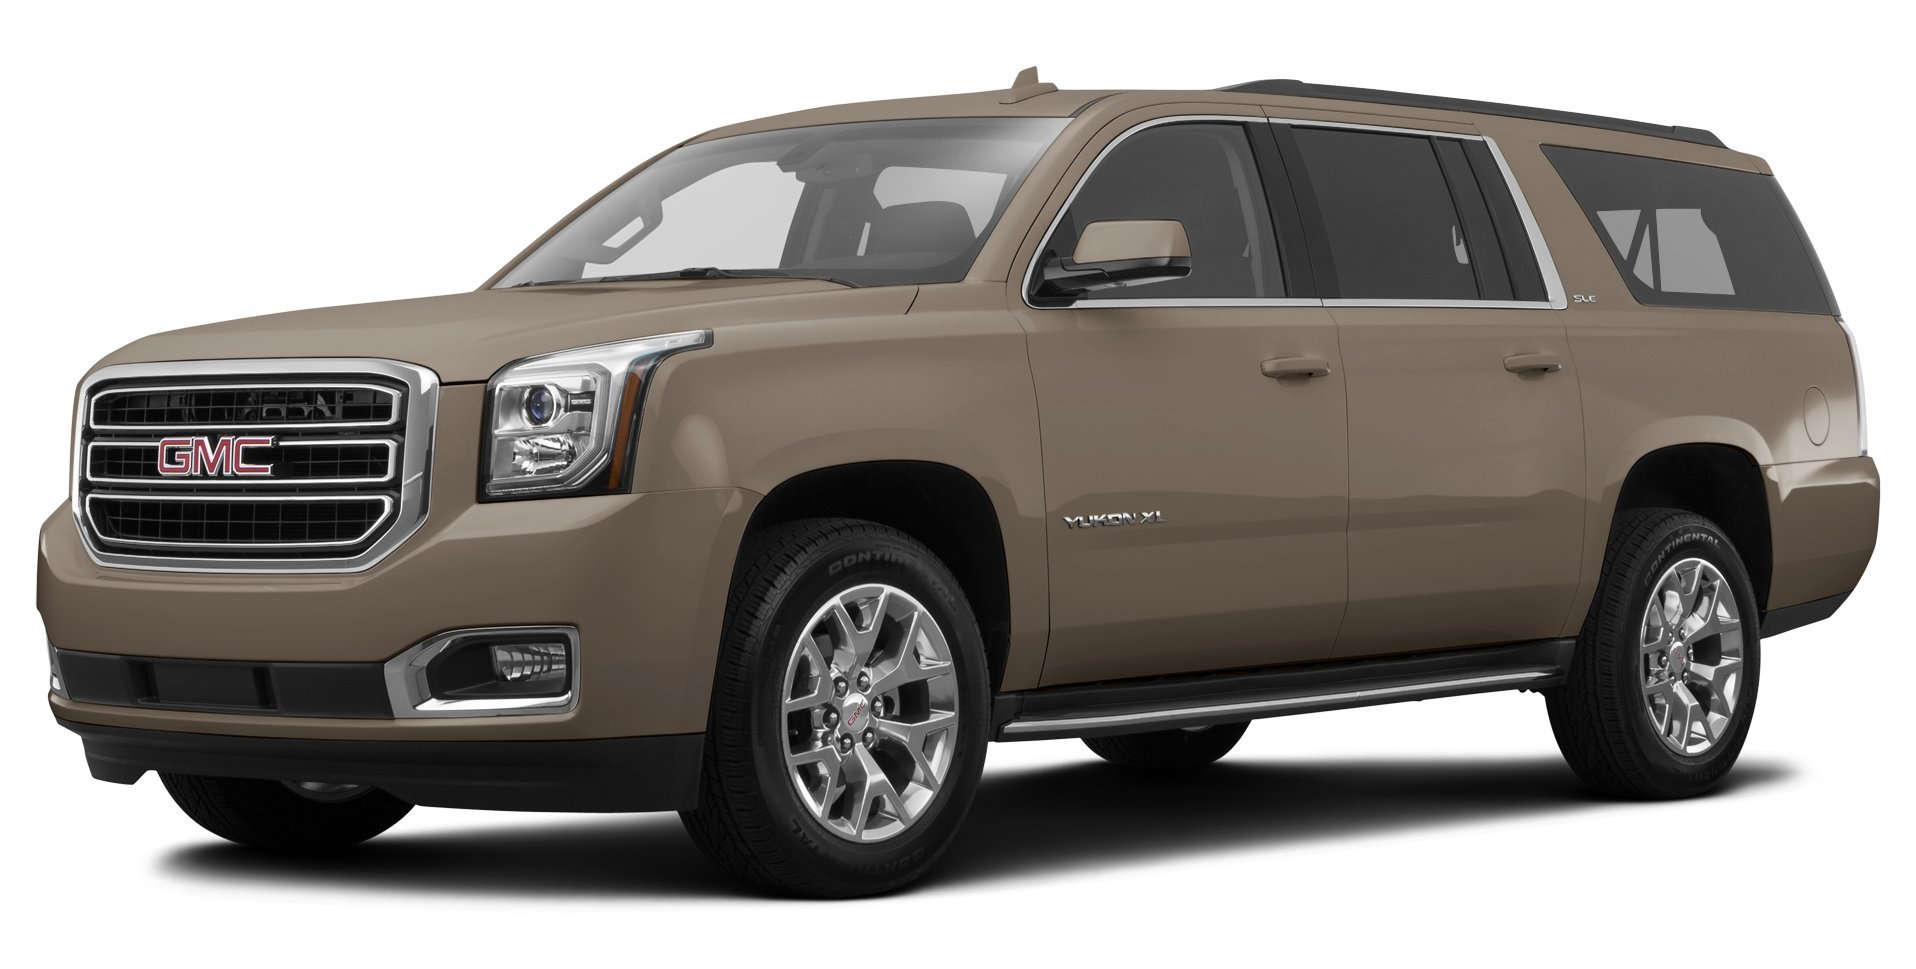 2 Door Tahoe New >> Amazon.com: 2016 Chevrolet Suburban Reviews, Images, and Specs: Vehicles